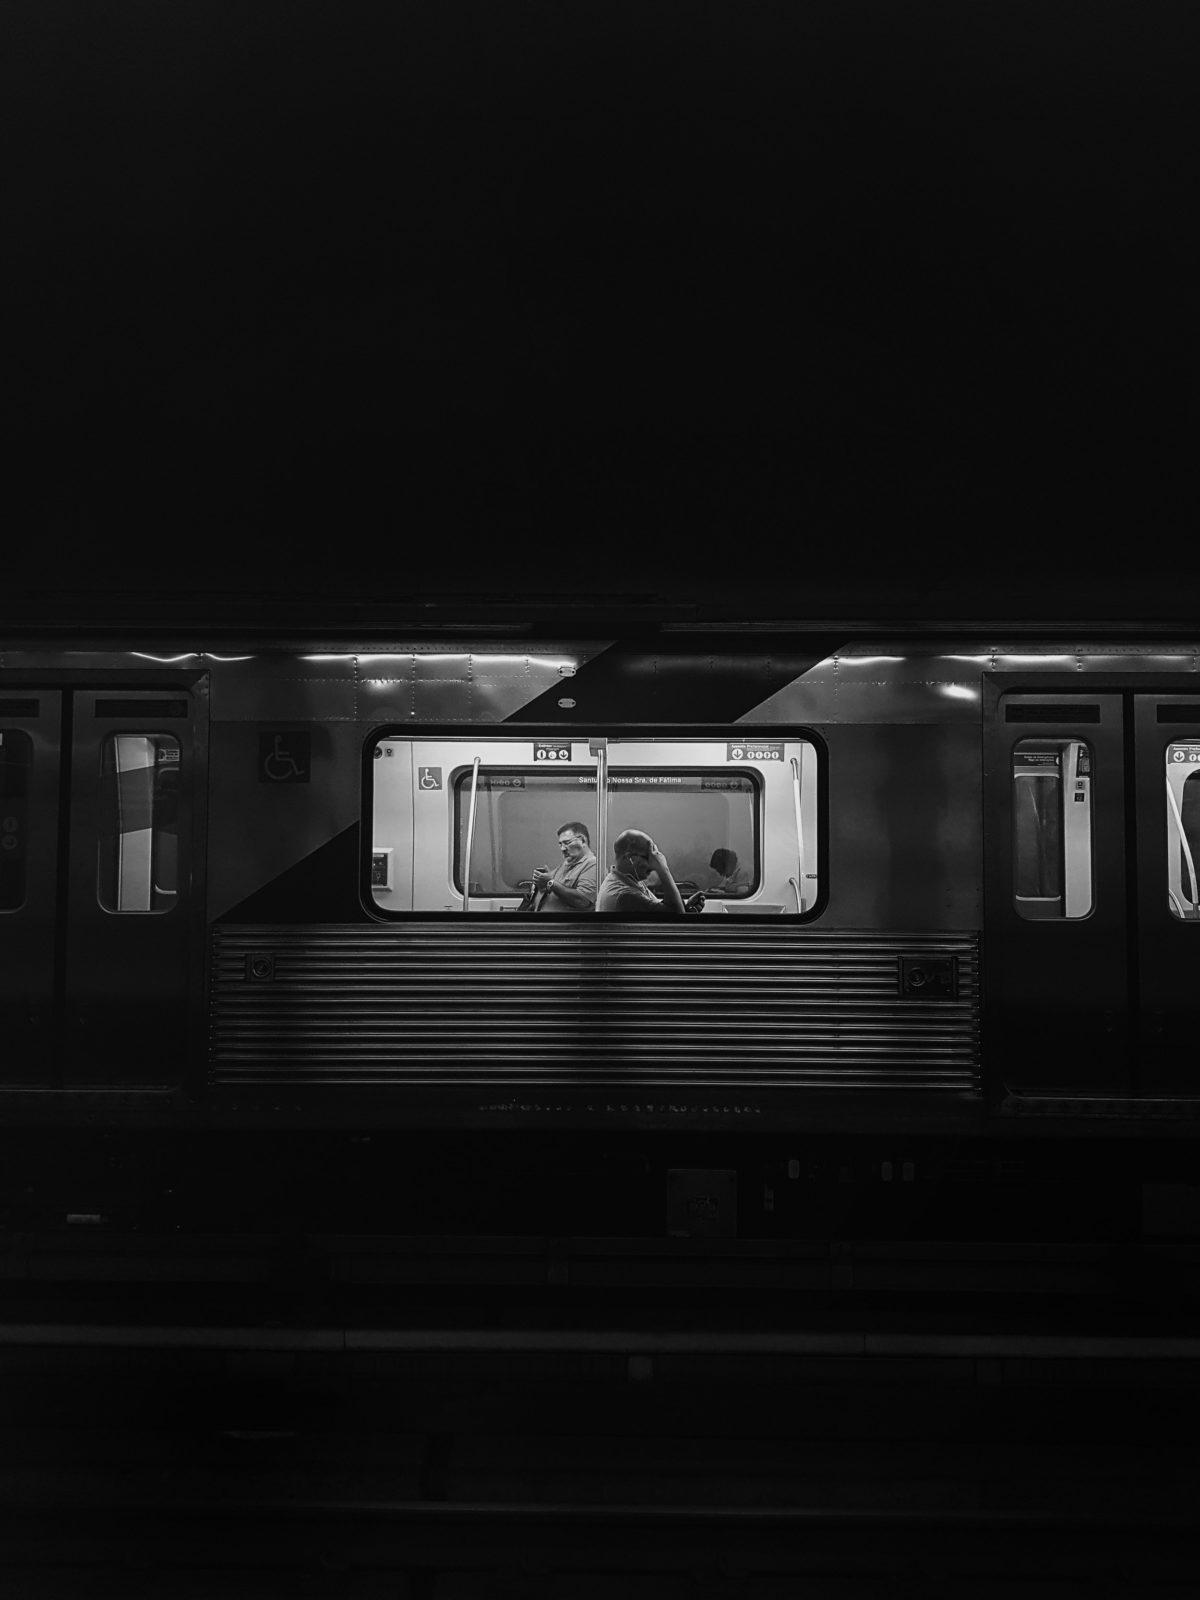 Dean's Journey Home